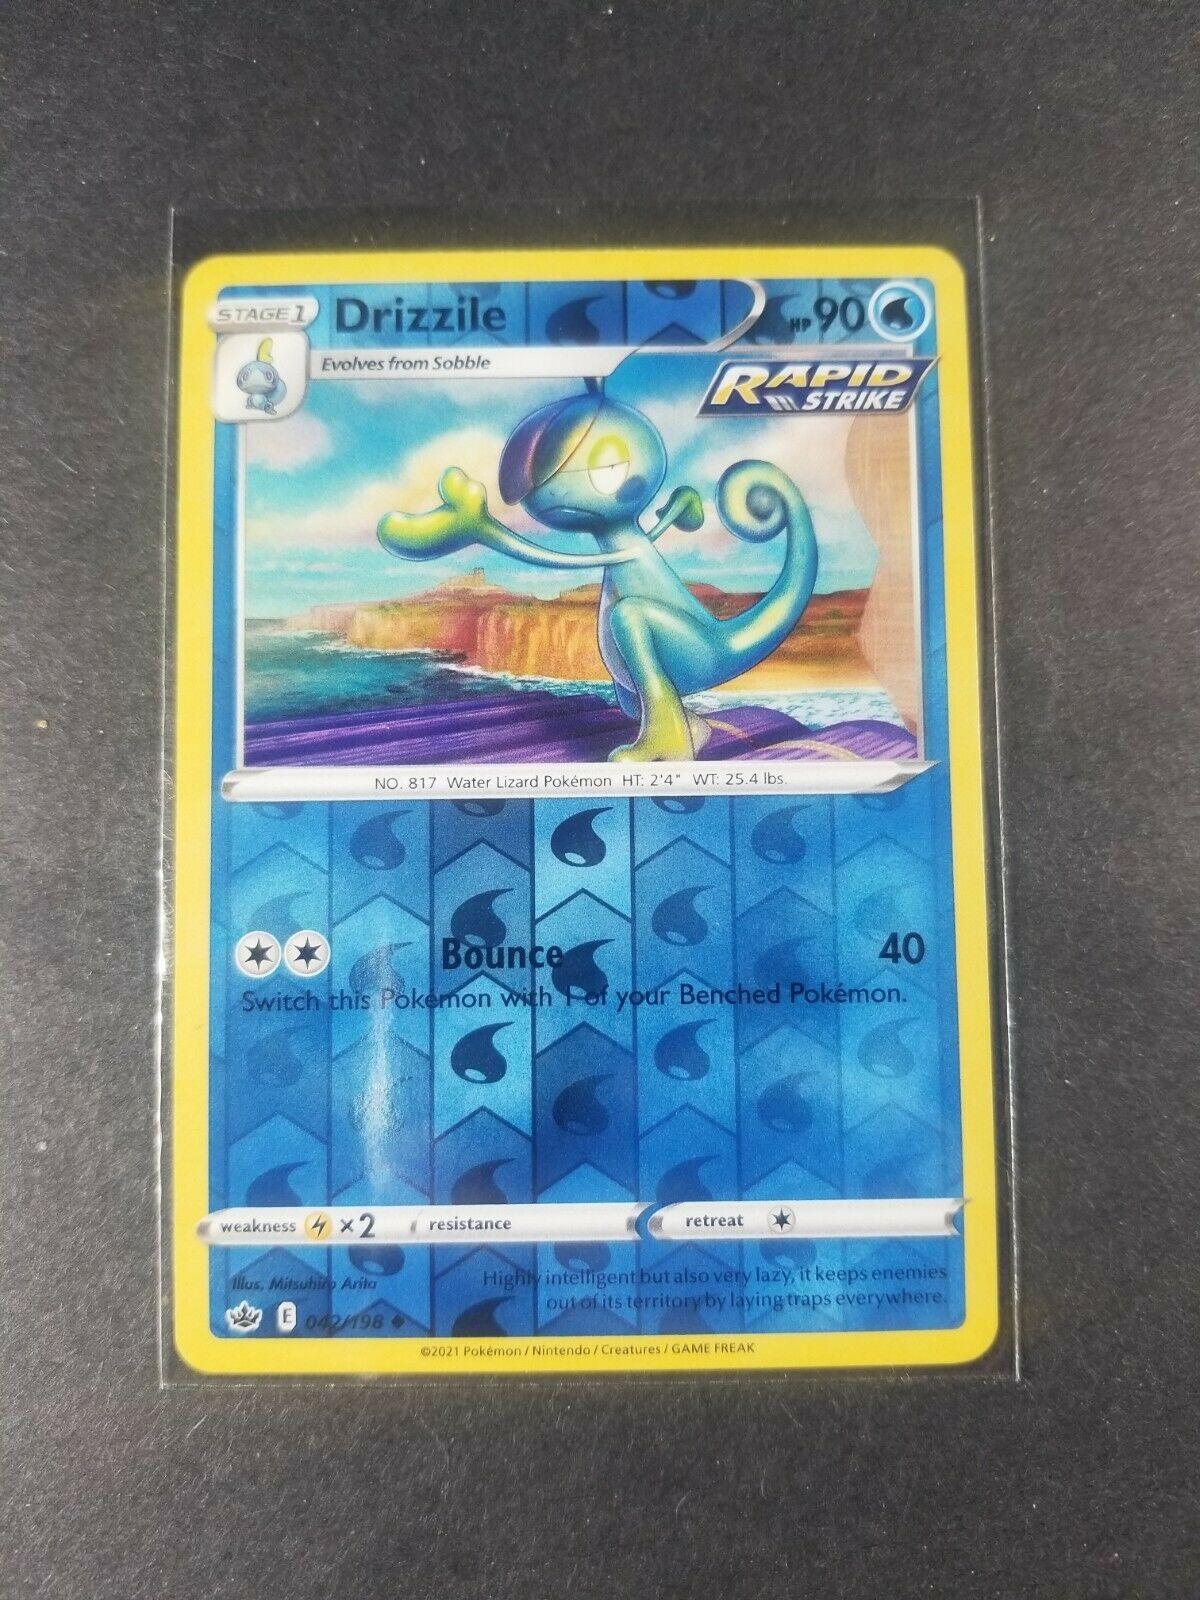 Drizzile 042/198 Reverse Holo Foil Rapid Strike Pokemon Card Chilling Reign